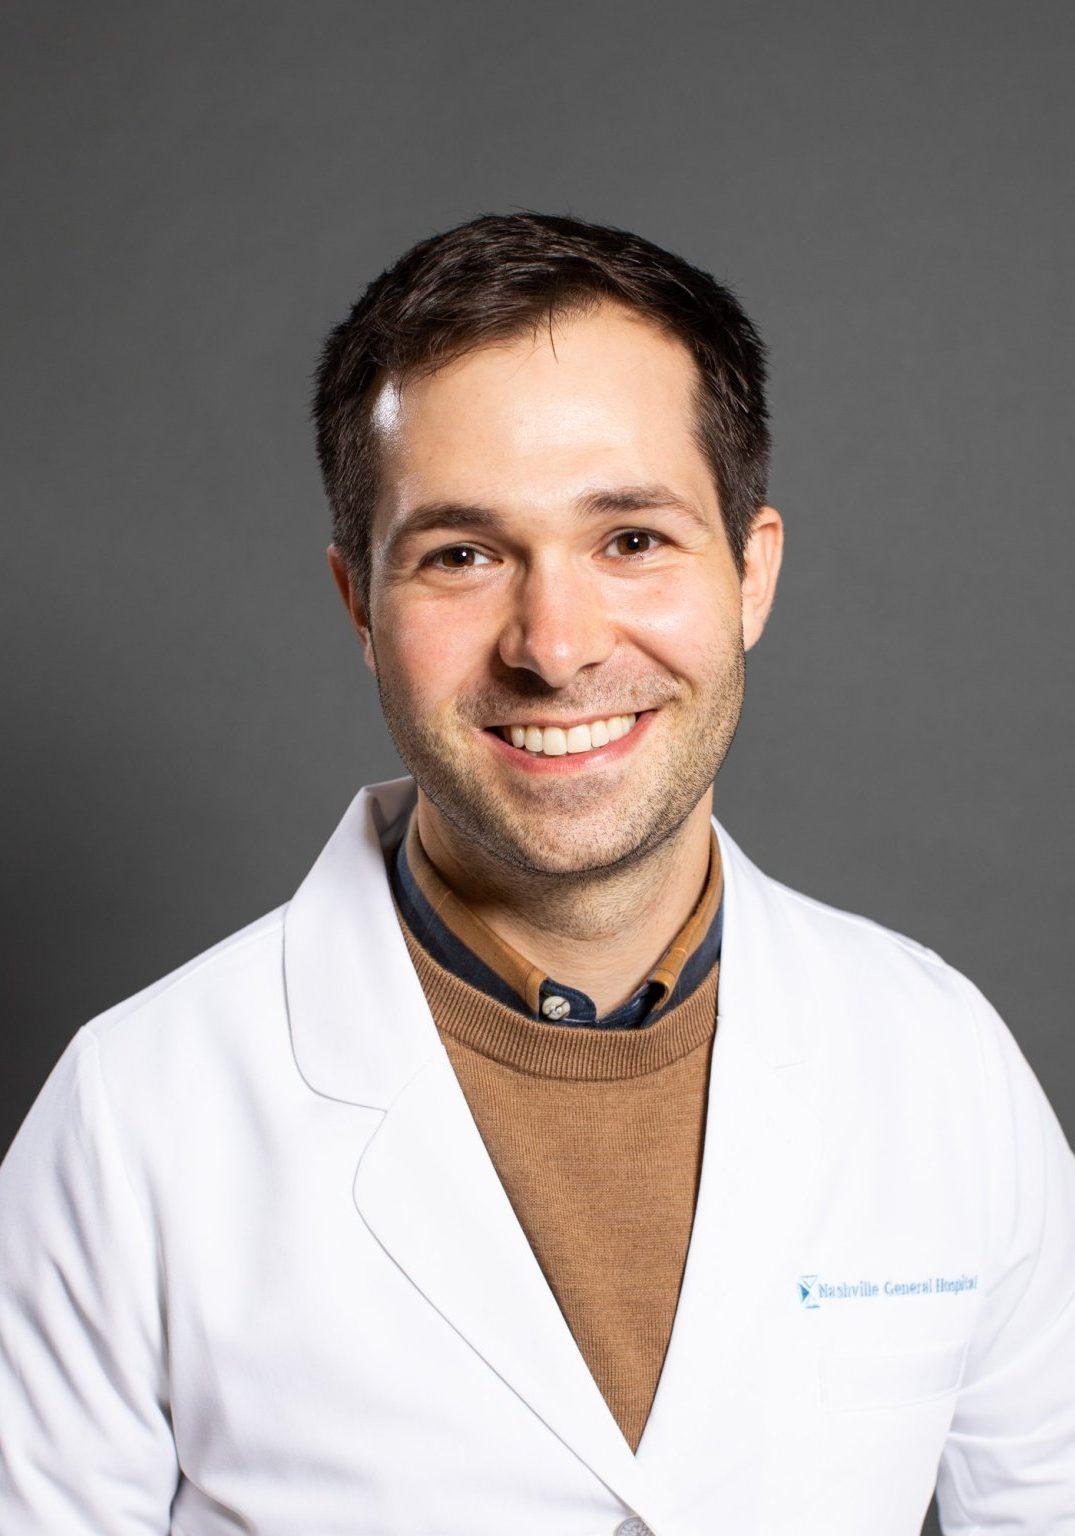 NGH_Ricky_Martin_Physician_Portraits_363